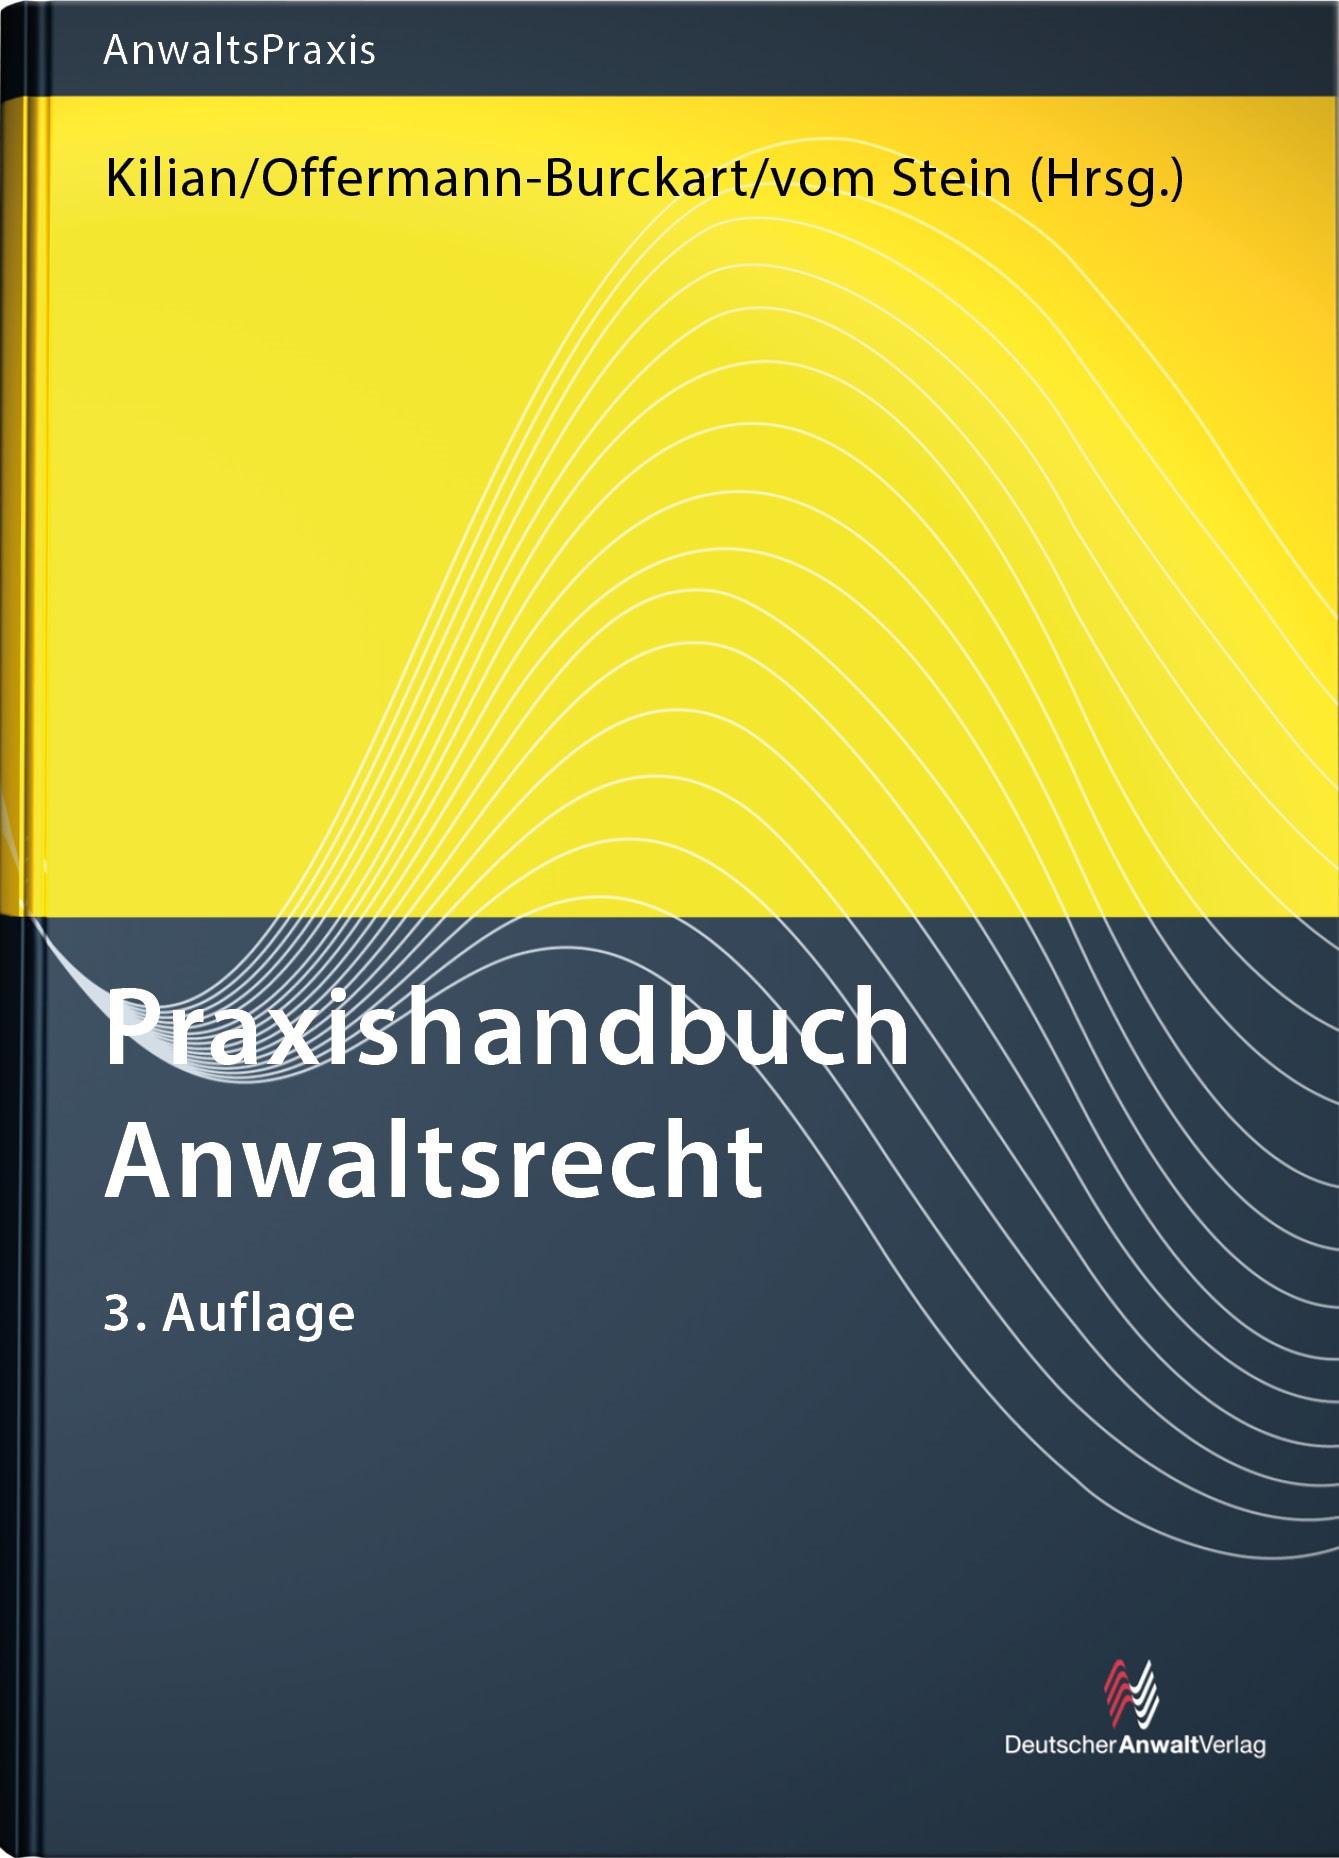 Praxishandbuch Anwaltsrecht | Kilian / Offermann-Burckart / vom Stein (Hrsg.), 2017 | Buch (Cover)